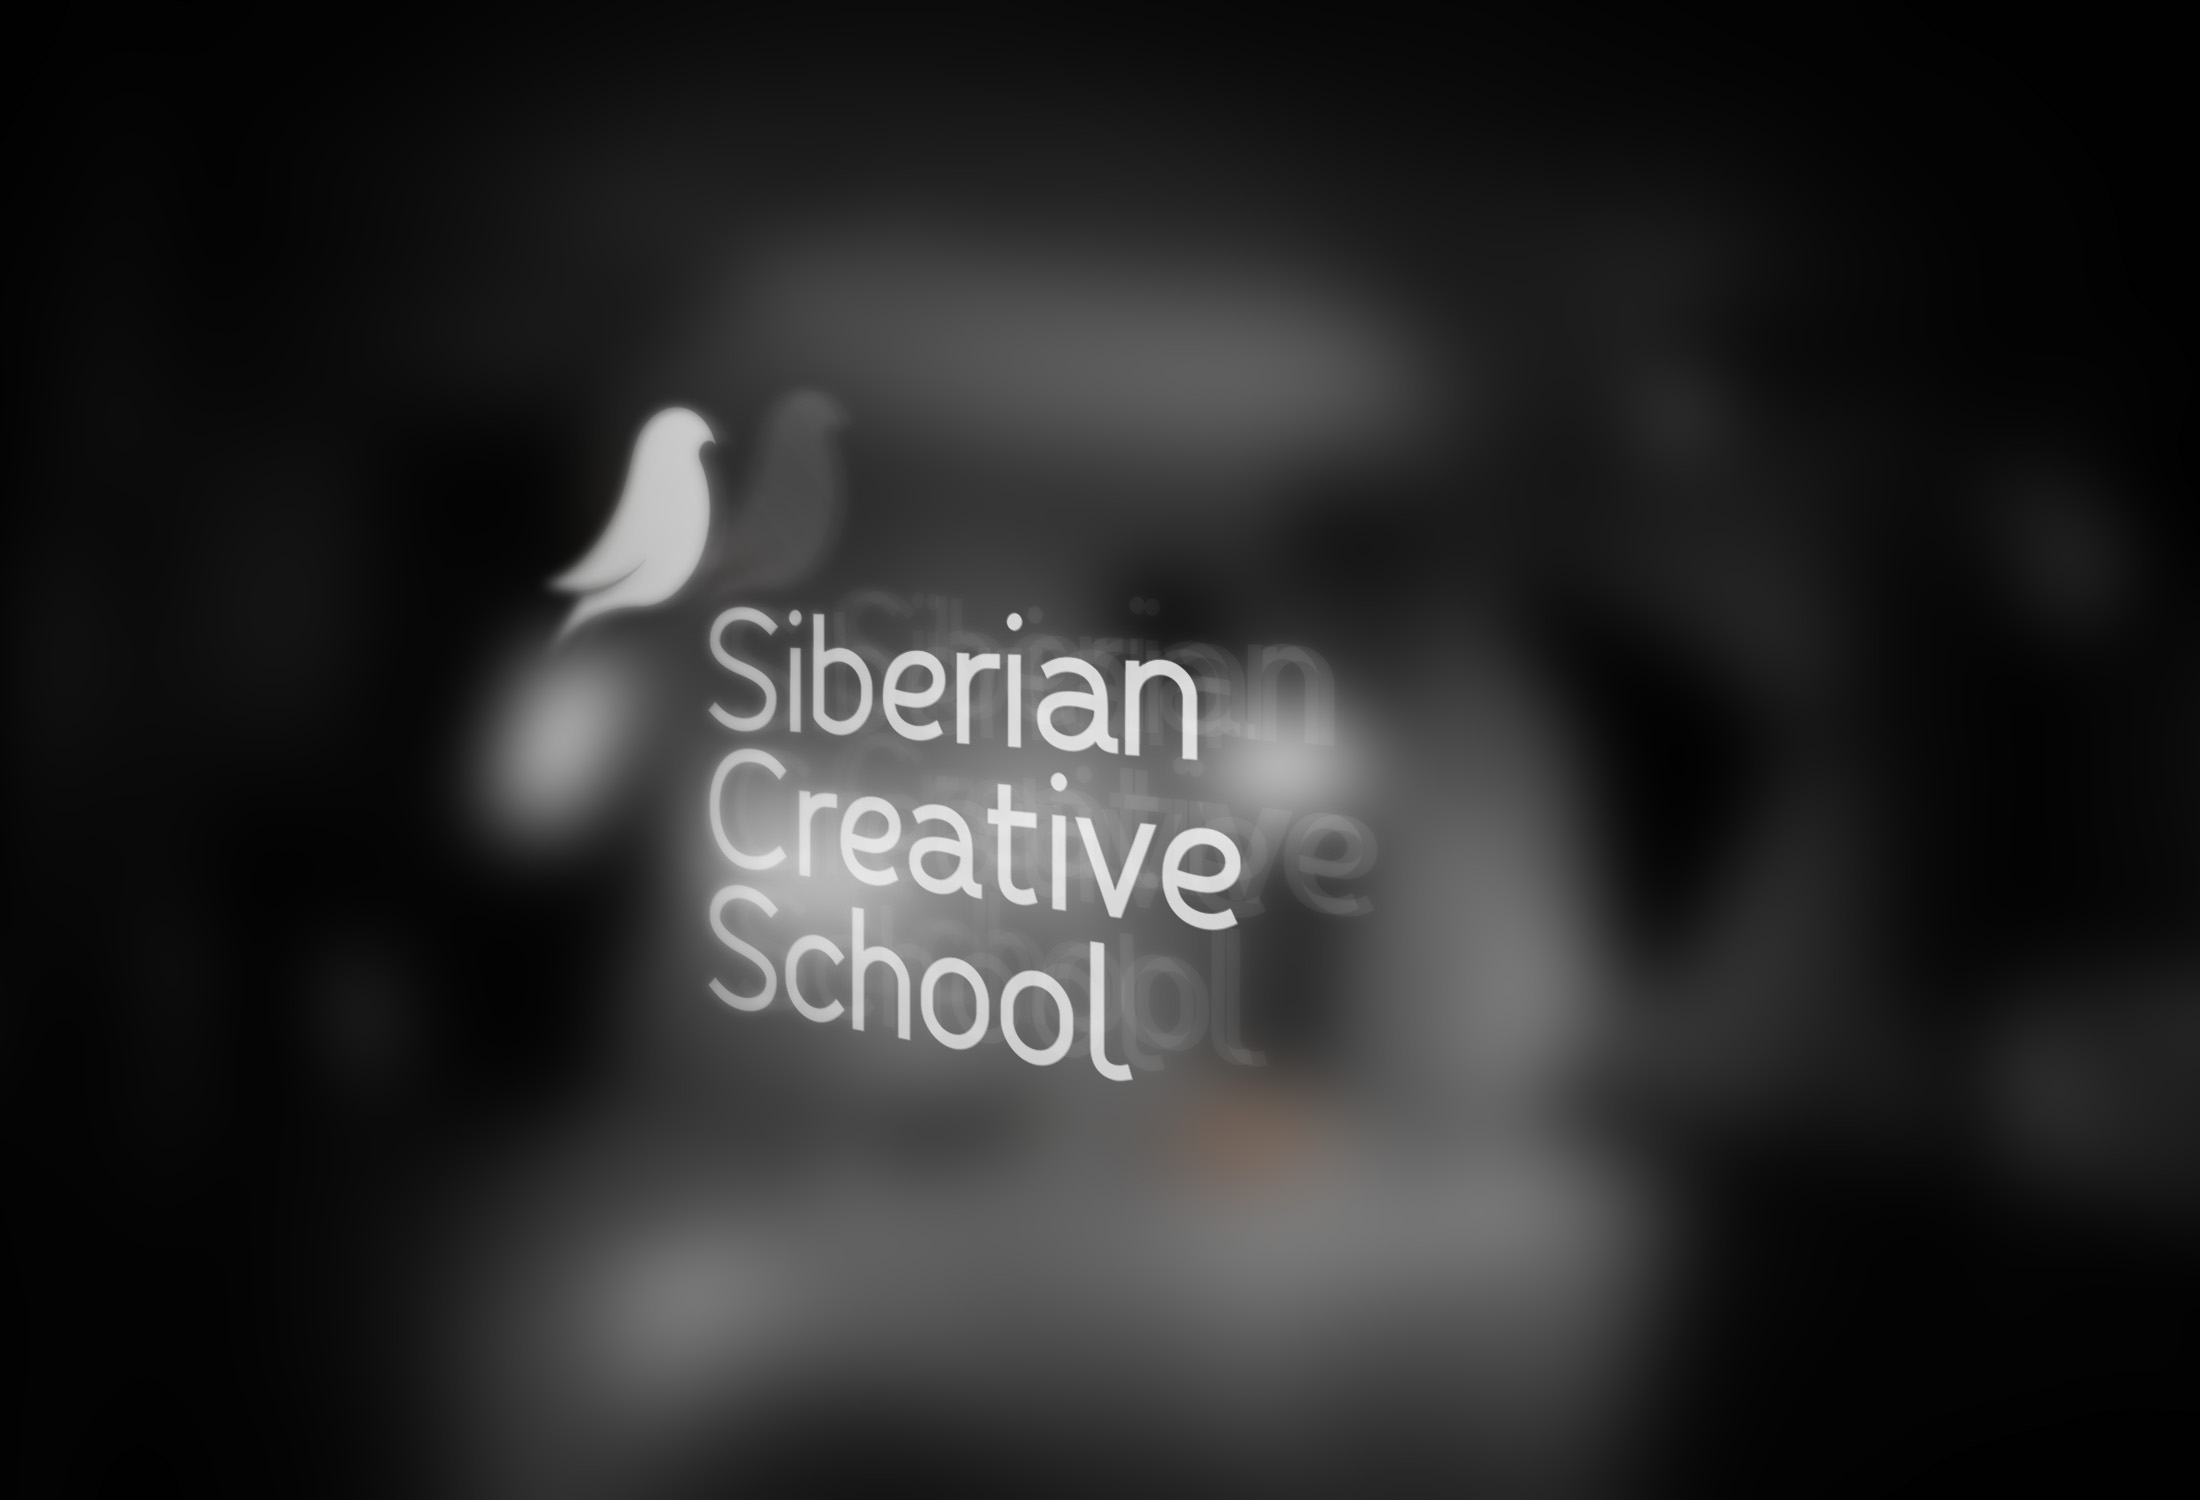 Siberian创意学校品牌形象设计